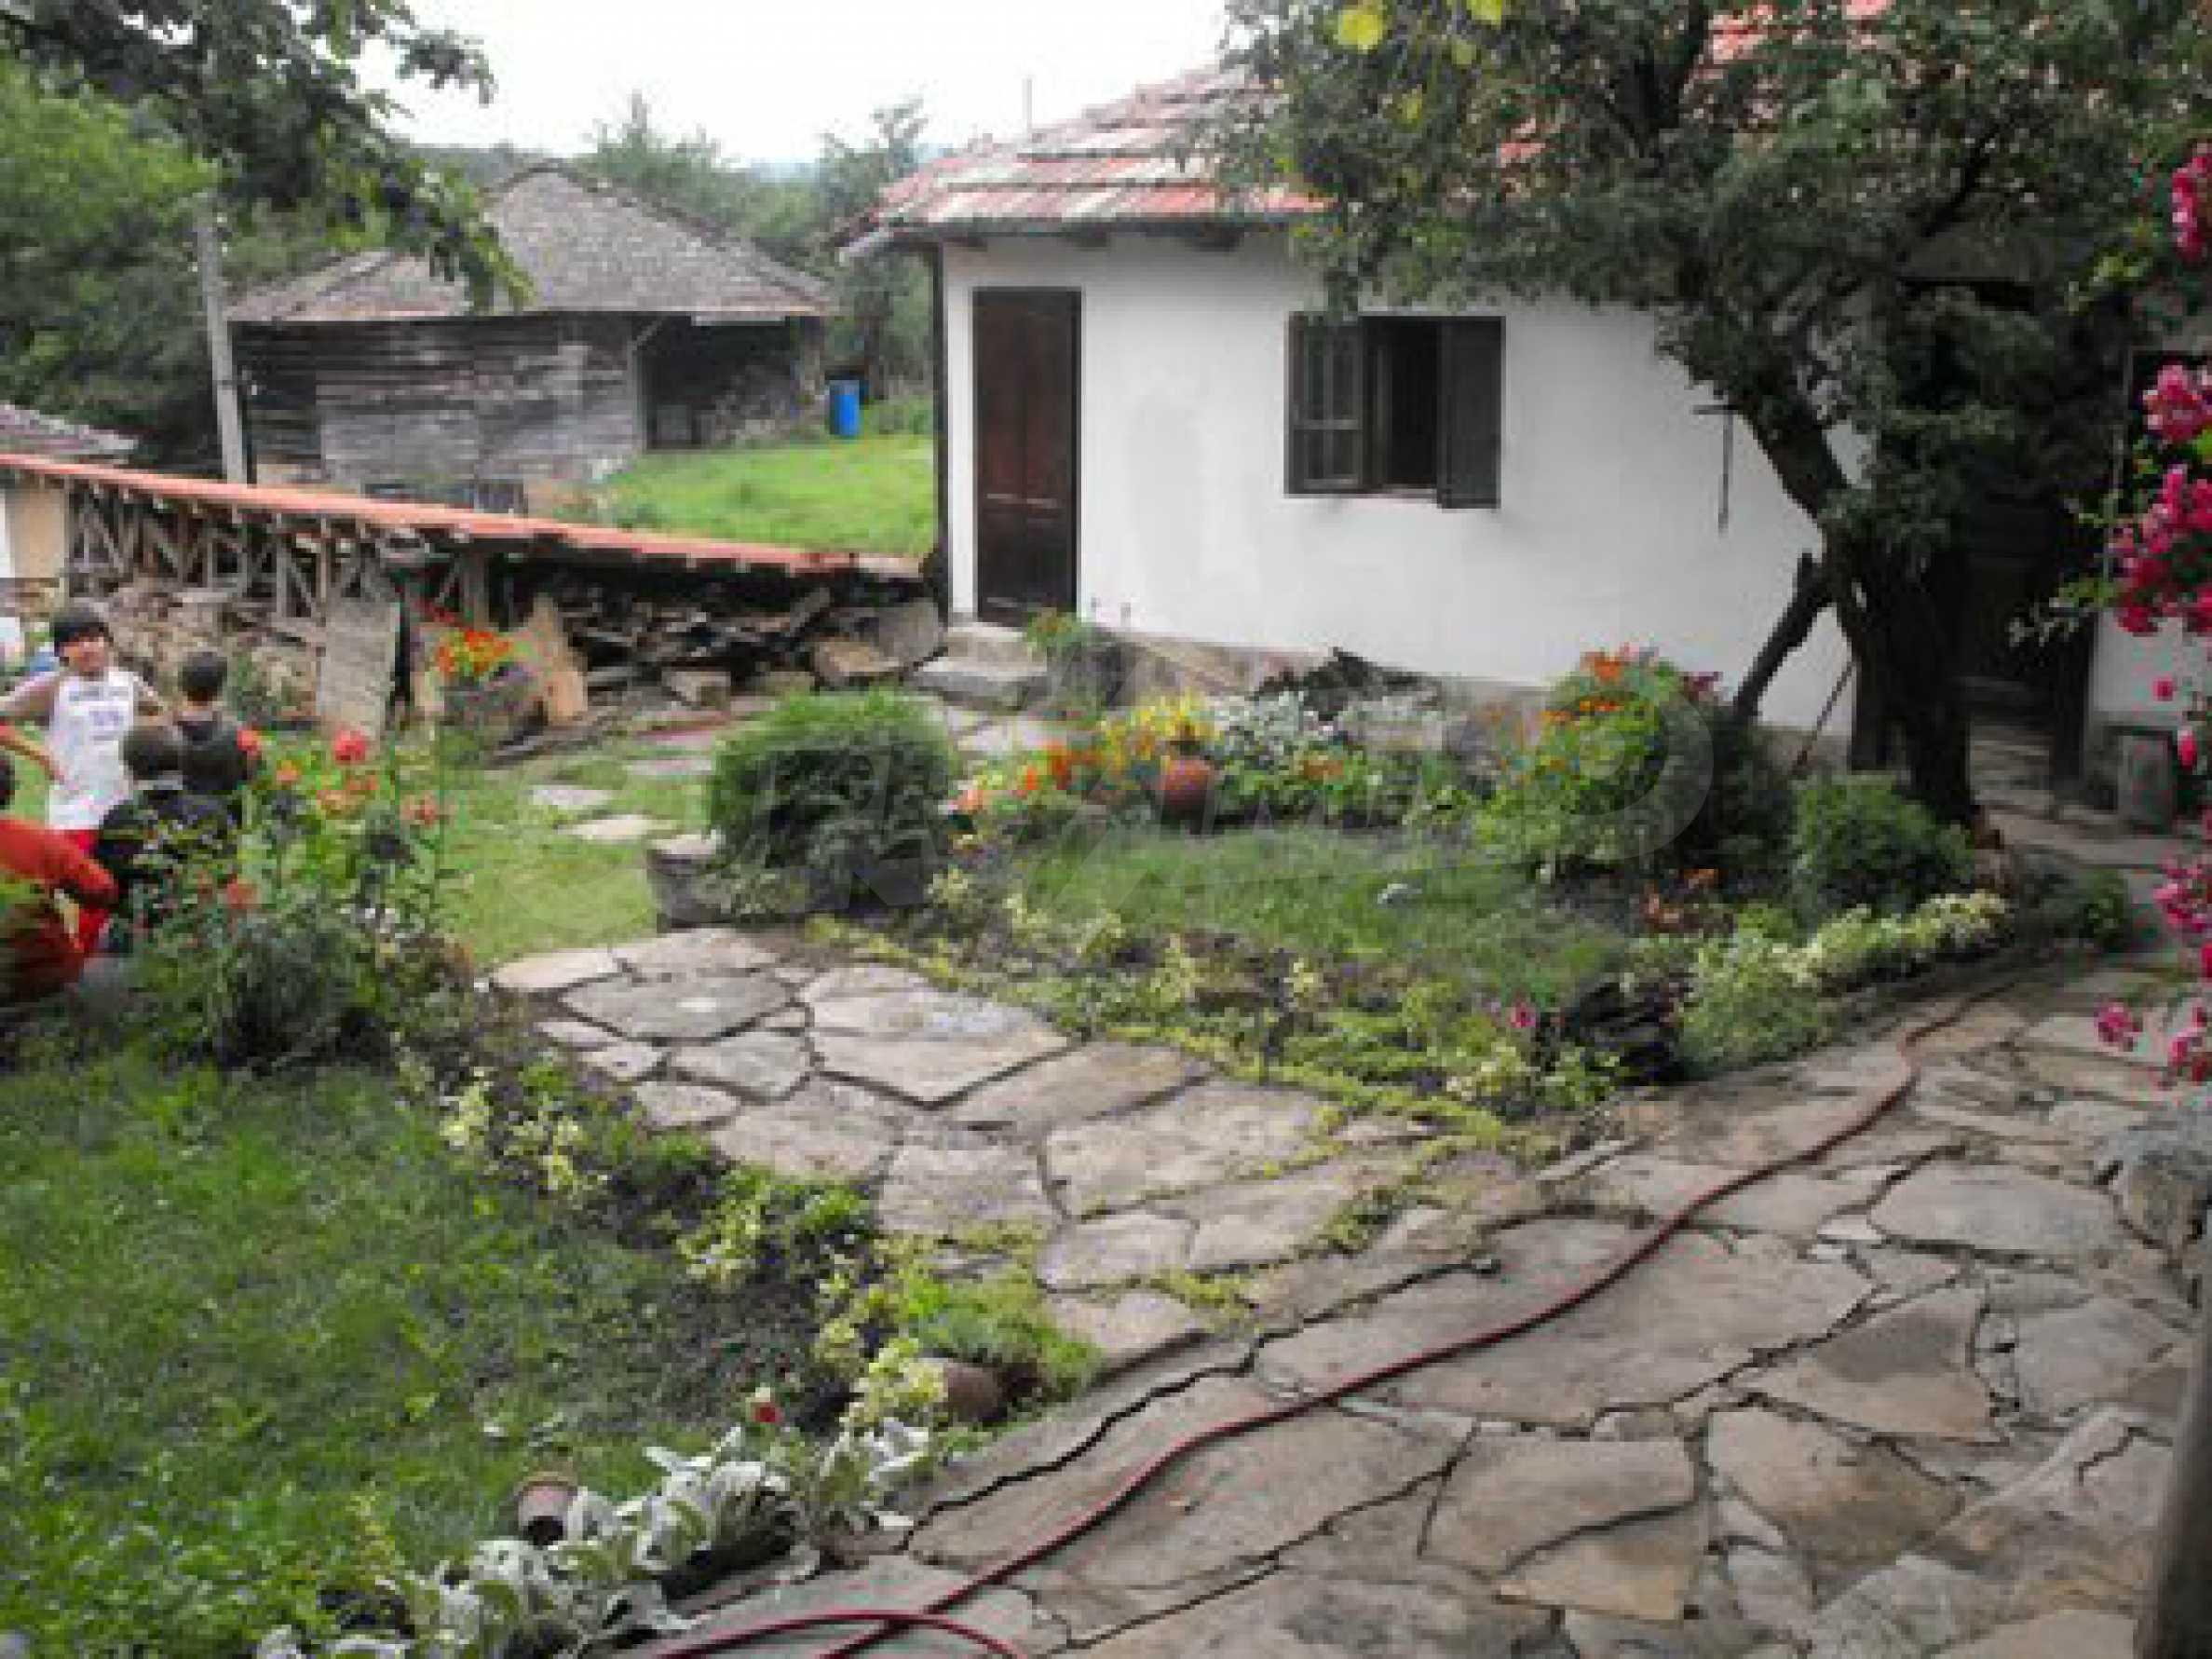 Revival House im Herzen des Balkans